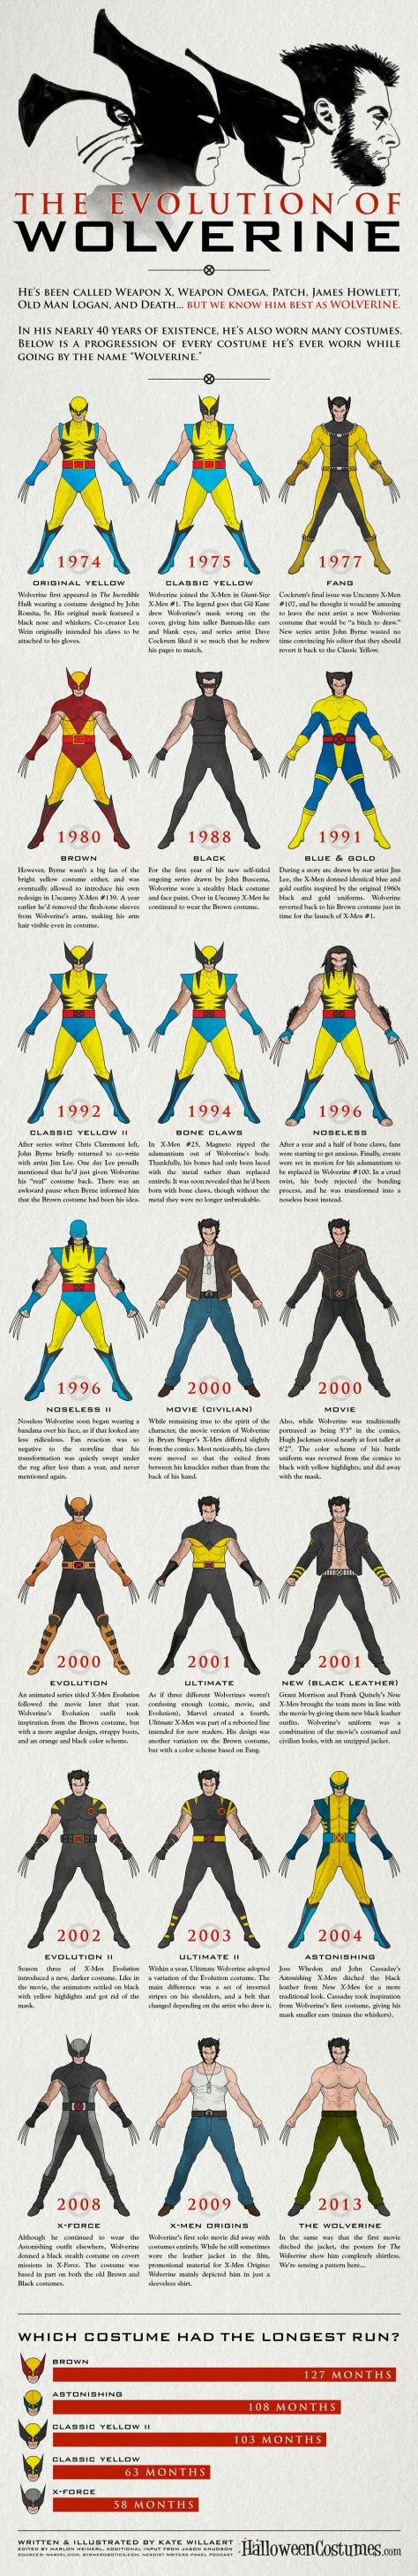 HalloweenCostumes.com: The Costume Evolution of Wolverine